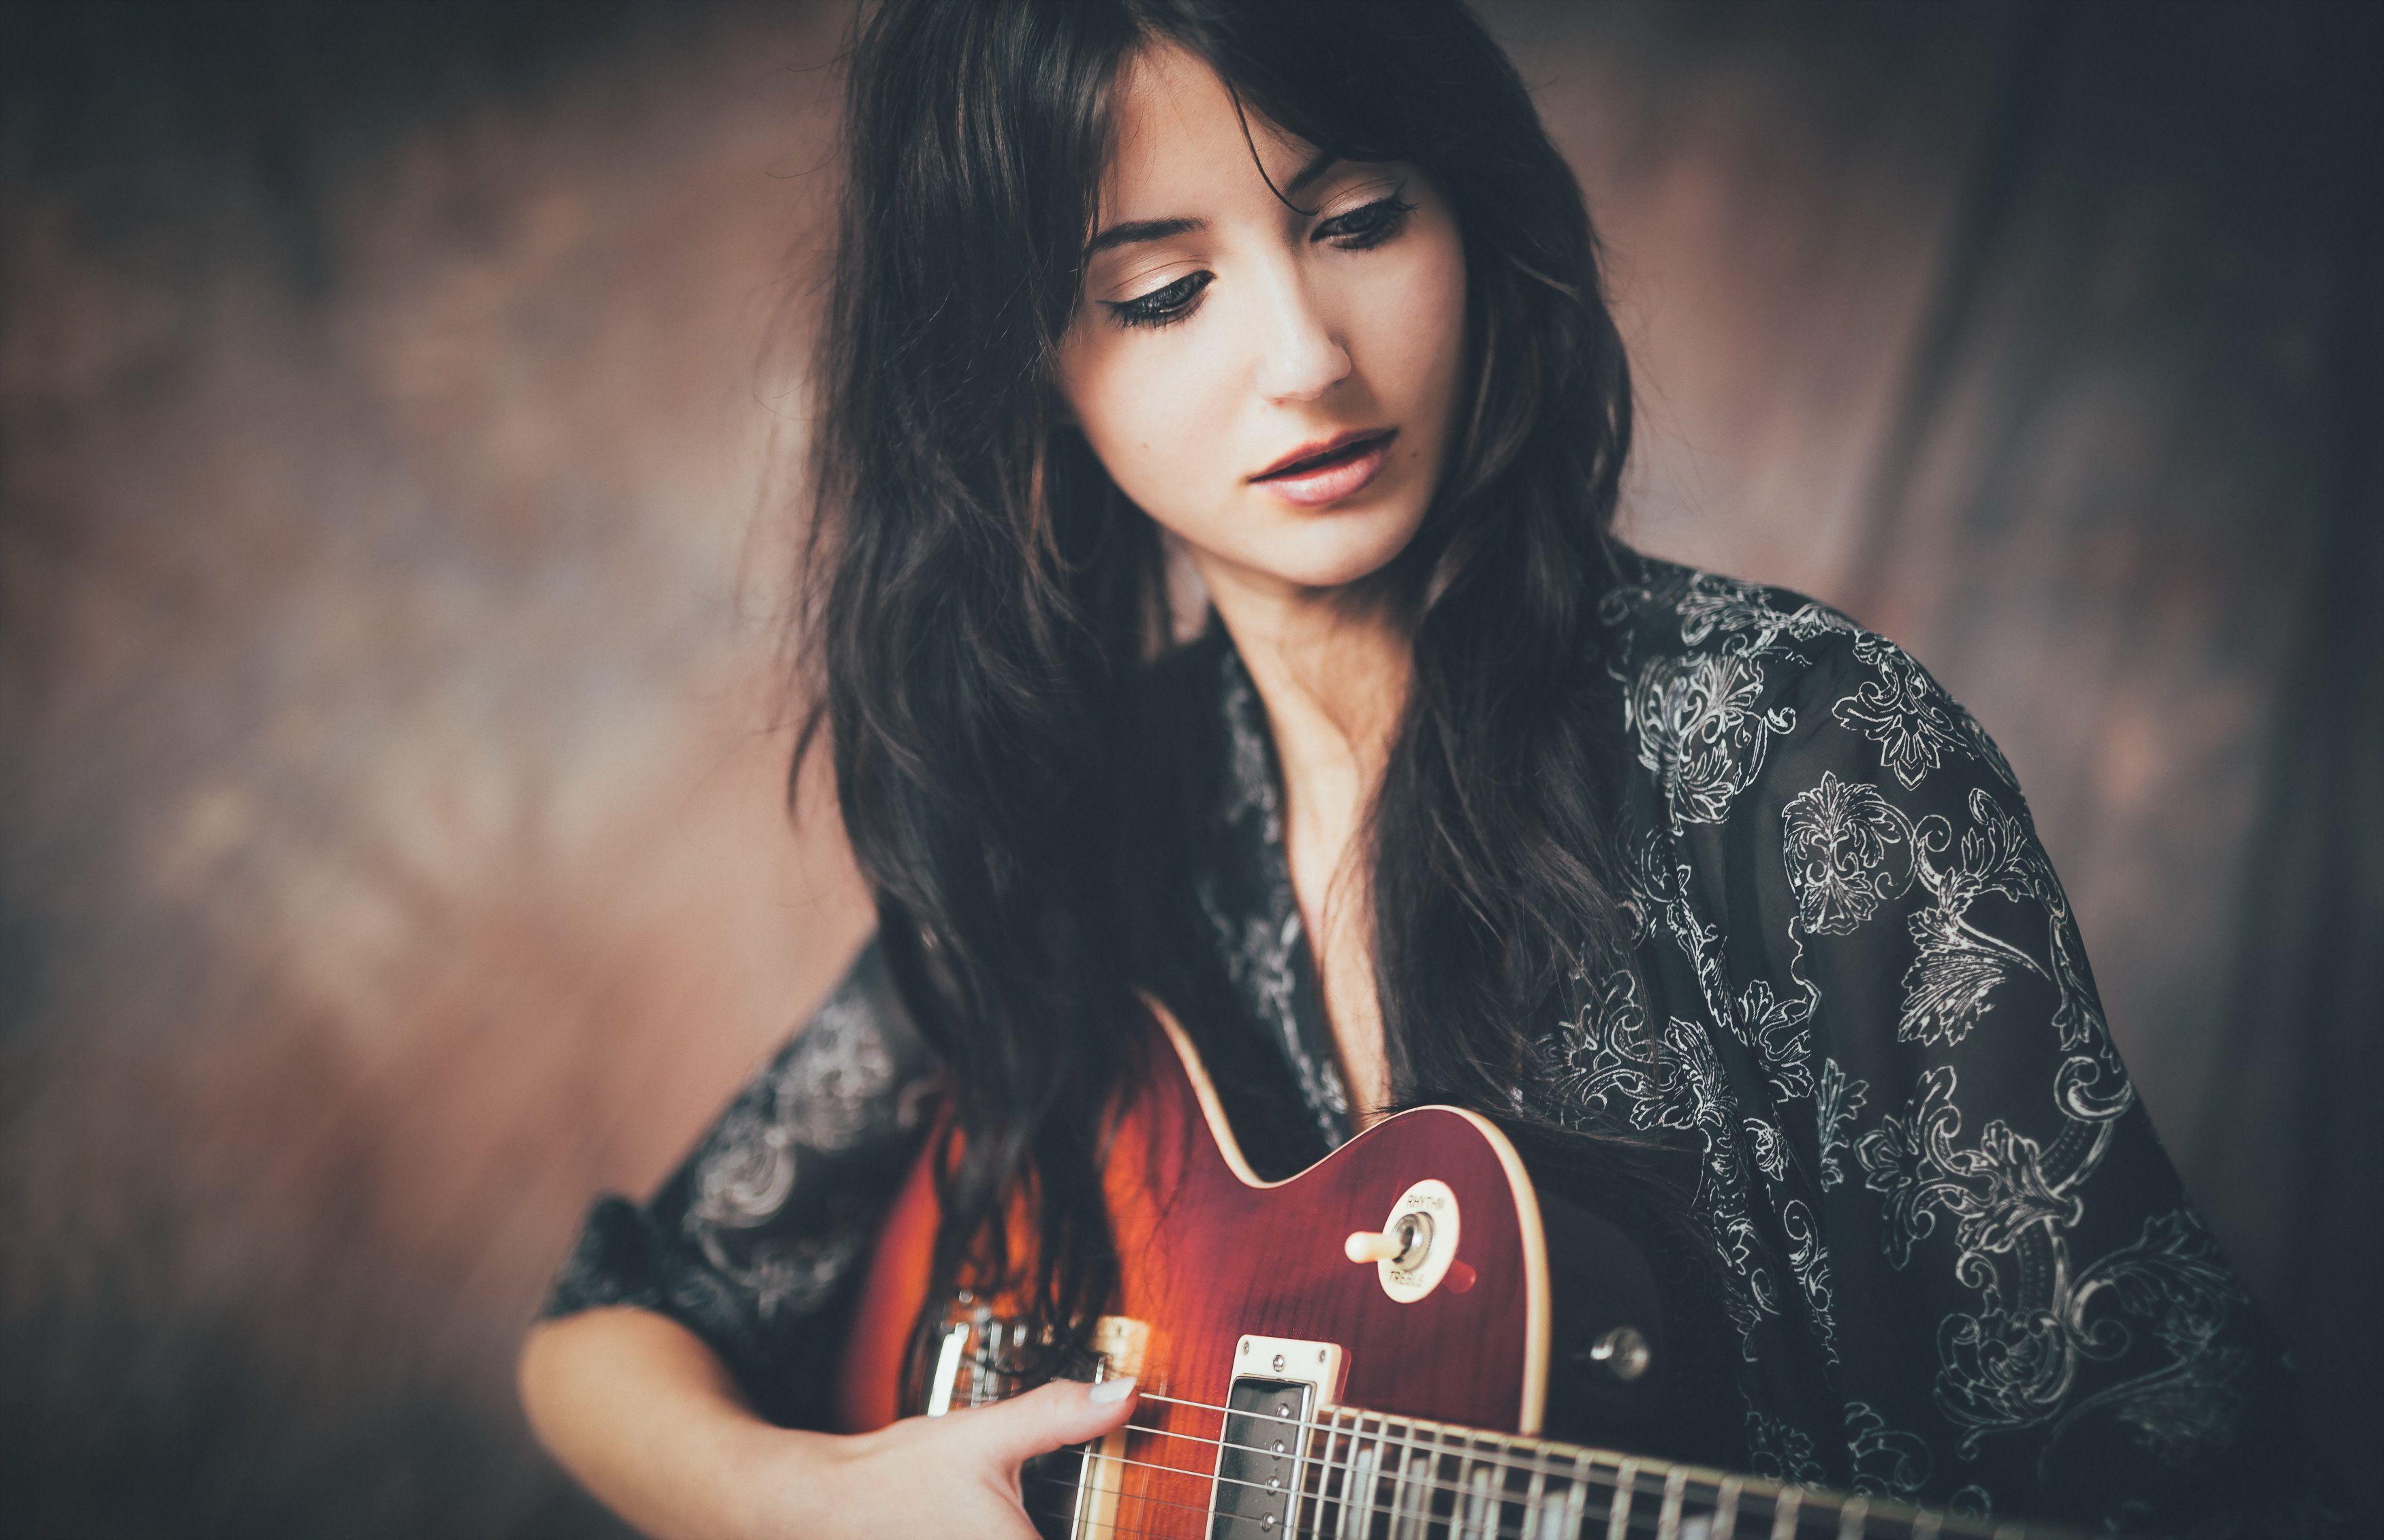 asian-rock-girl